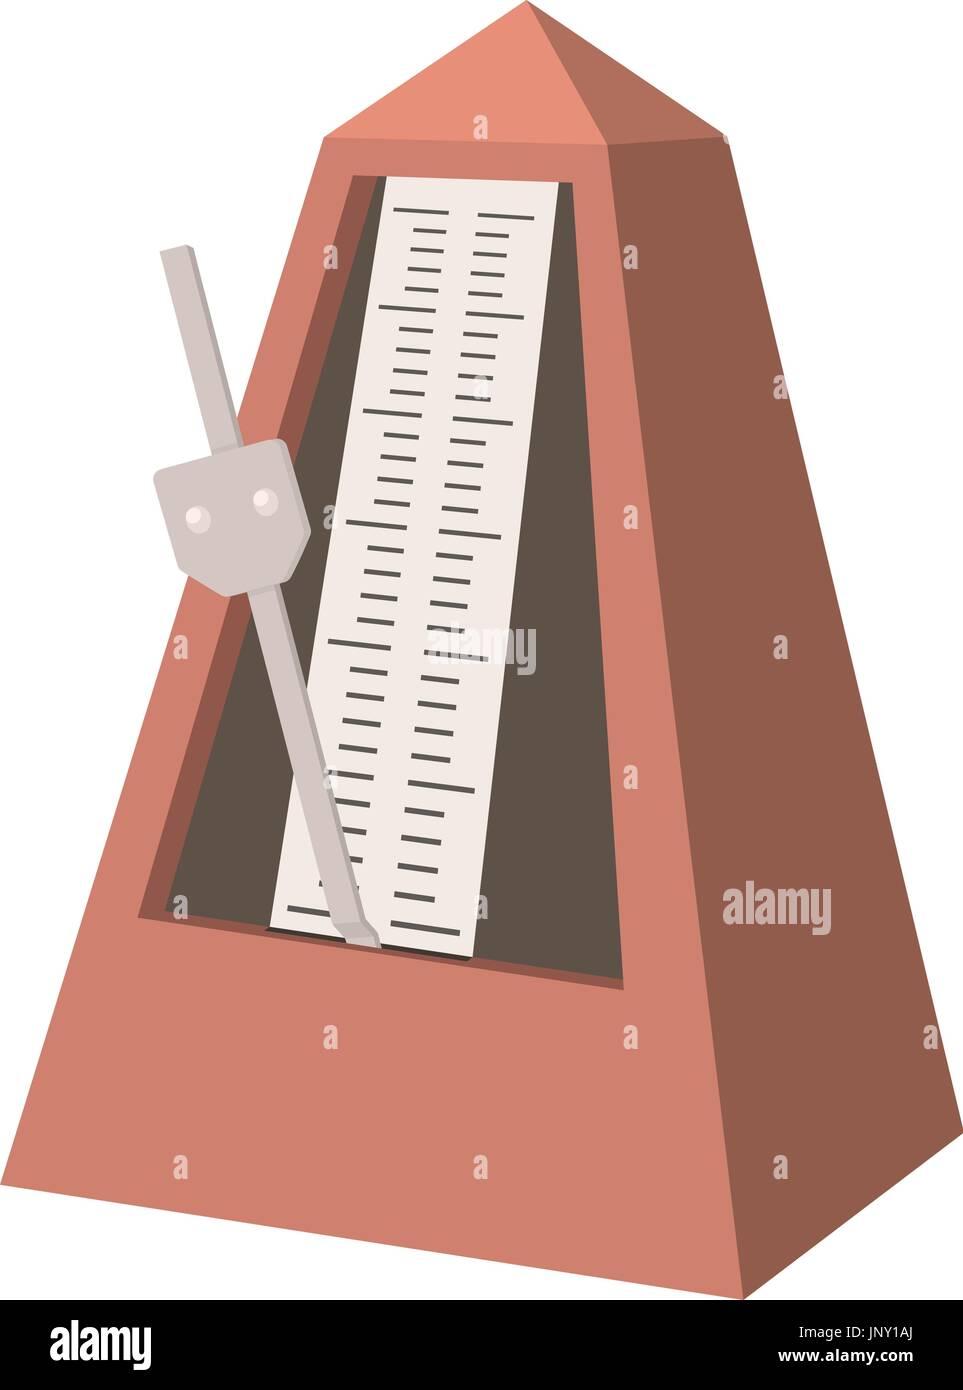 Metronome icon, cartoon style - Stock Image